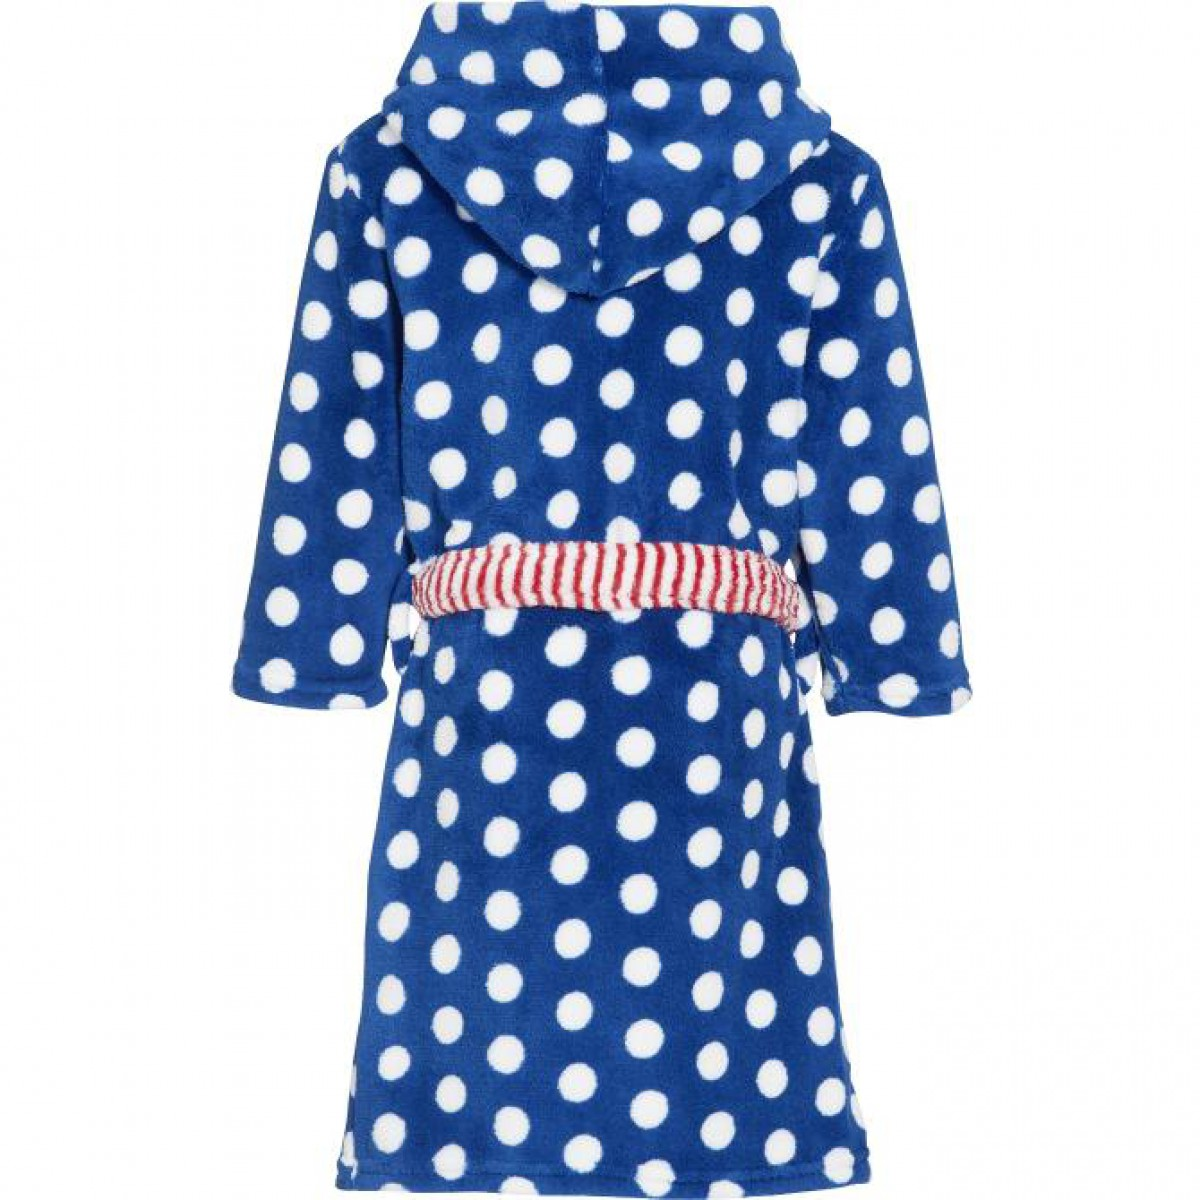 kinderbadjassen online